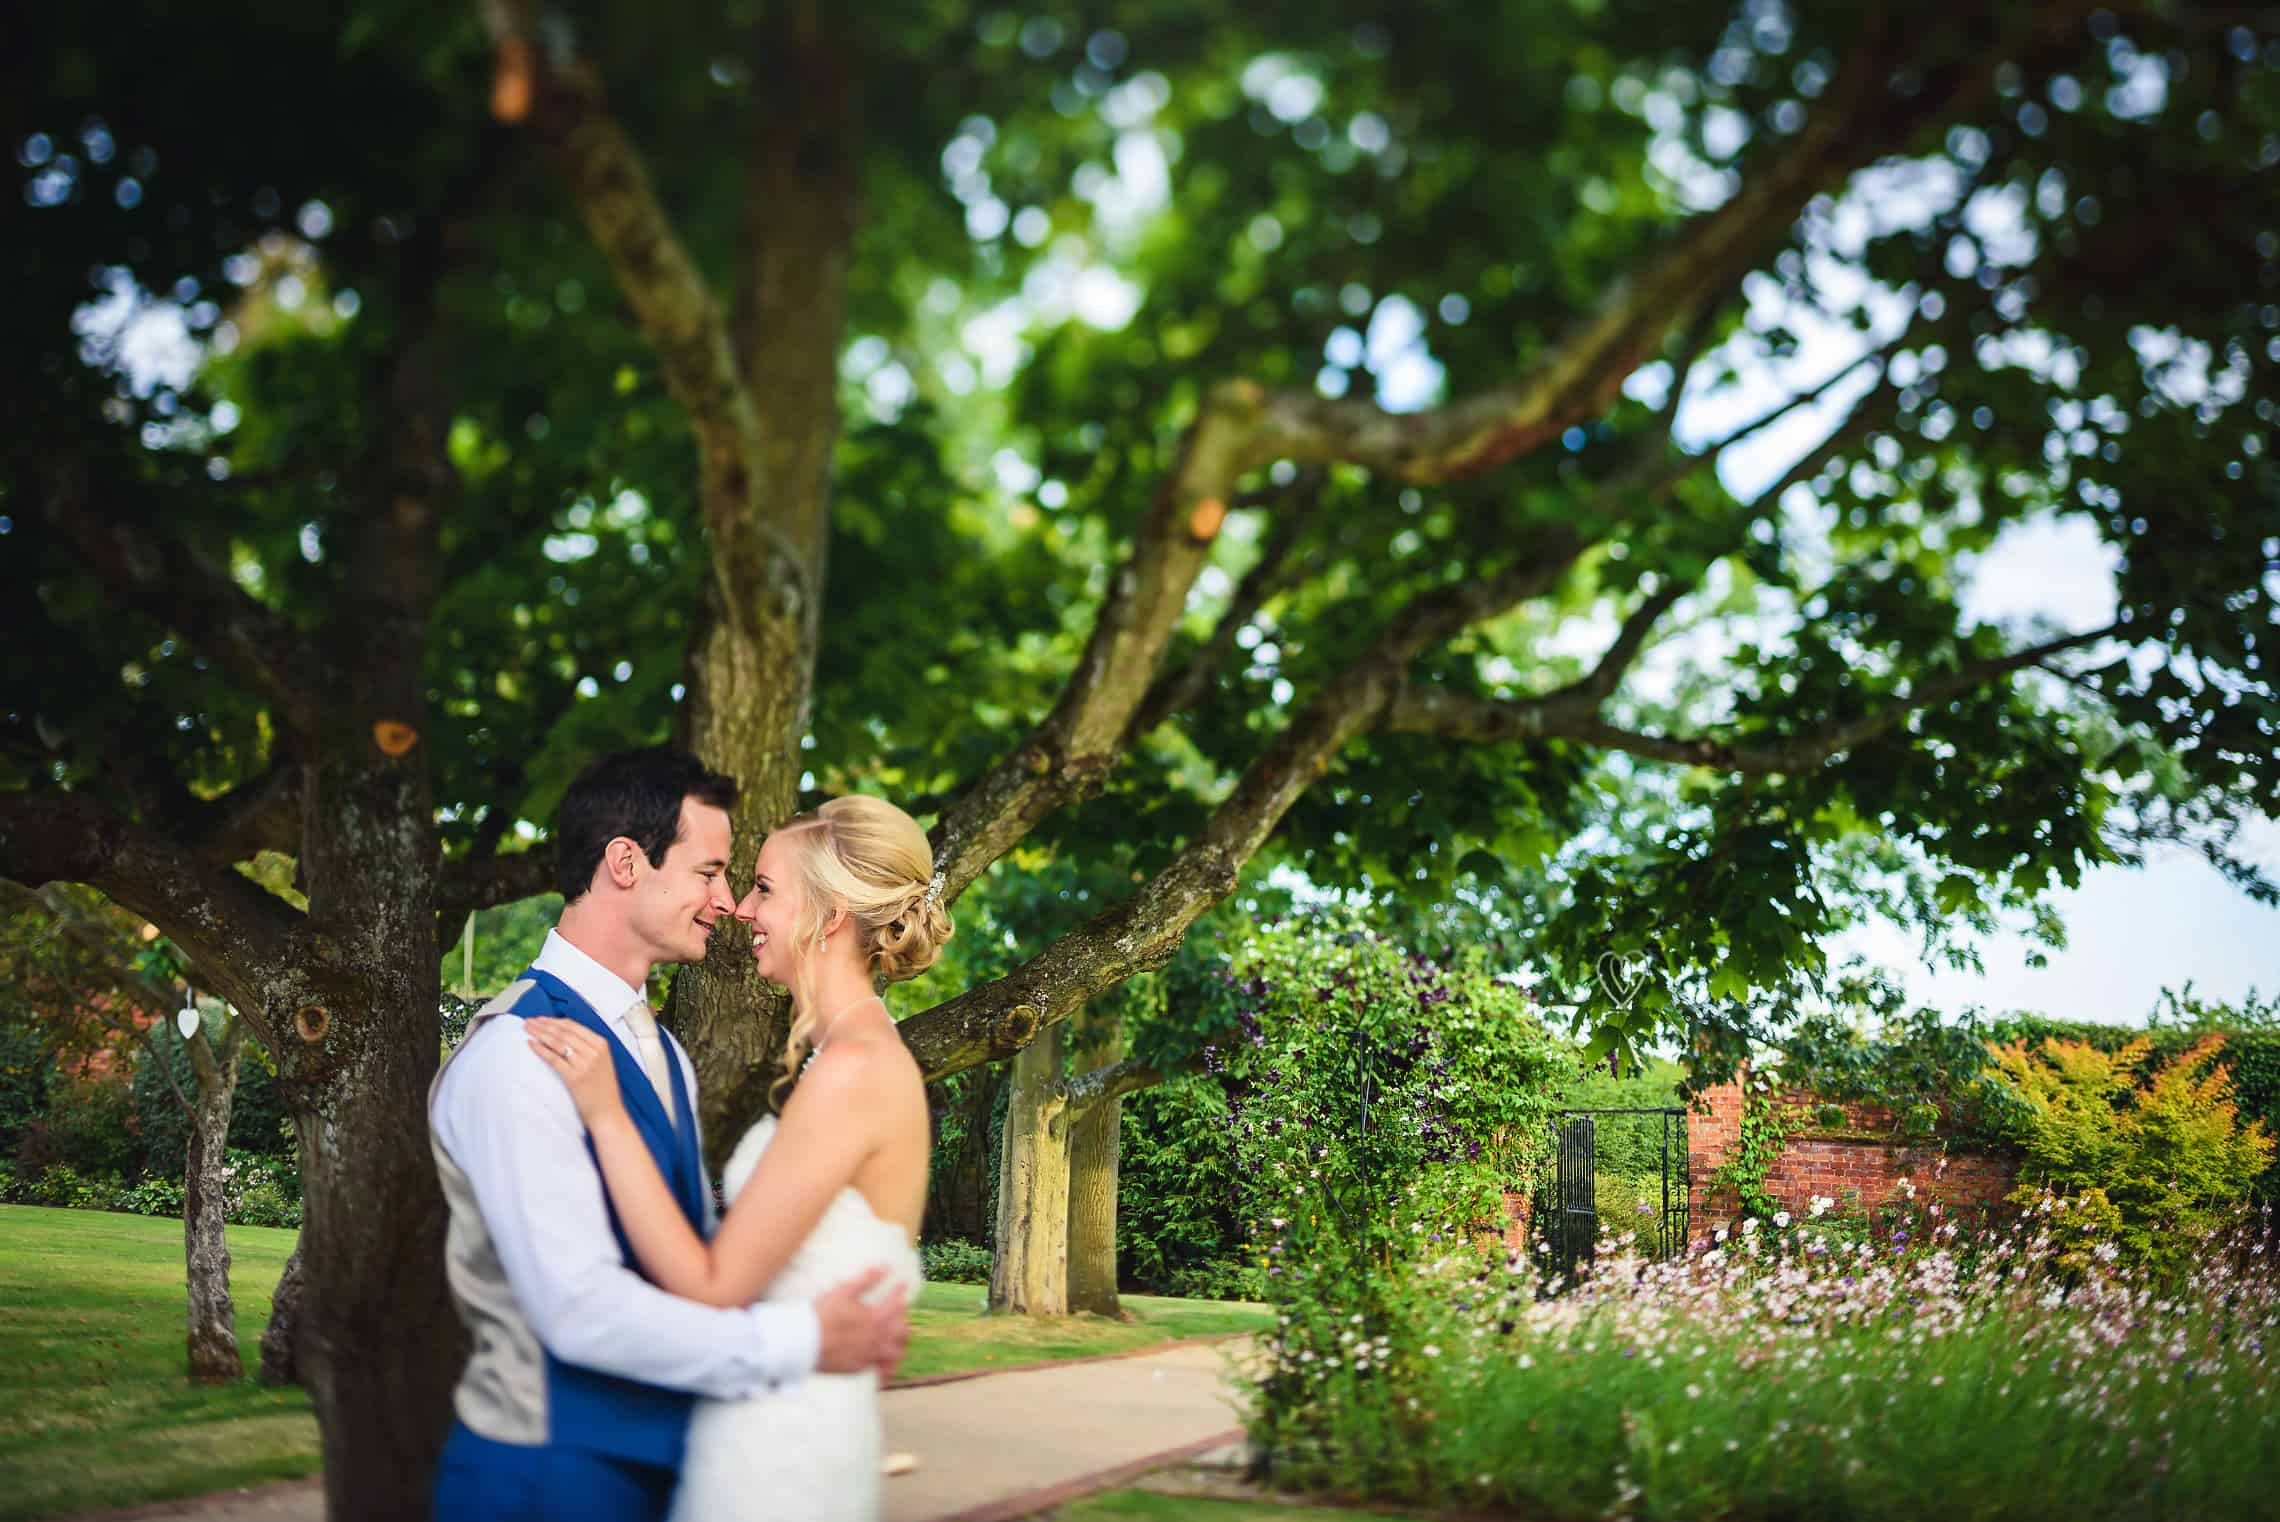 gaynes_park_wedding_lm_justin_bailey_photography_015